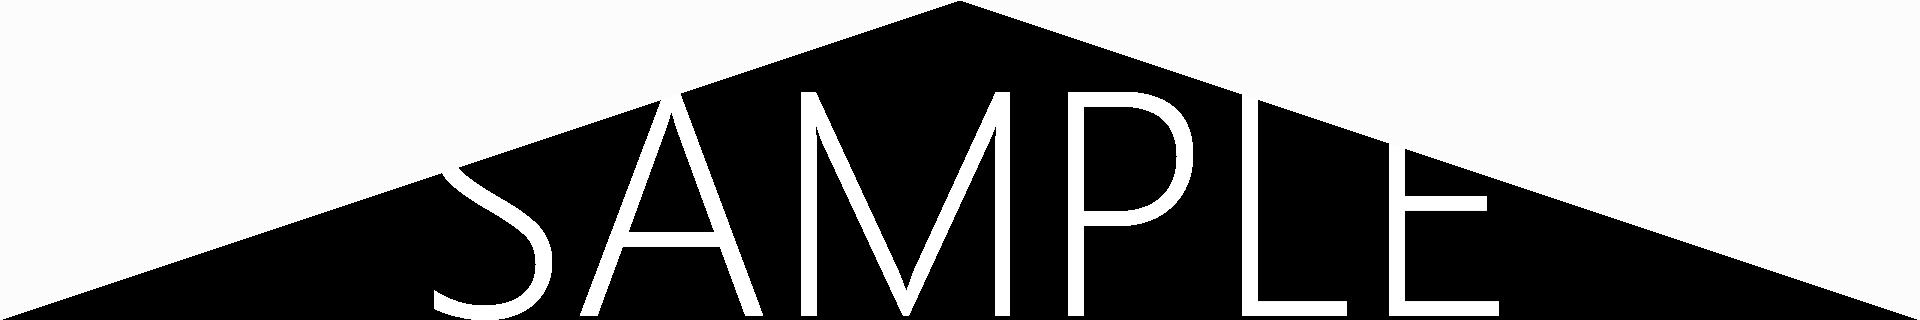 SAMPLE/_triangle-transparent-up